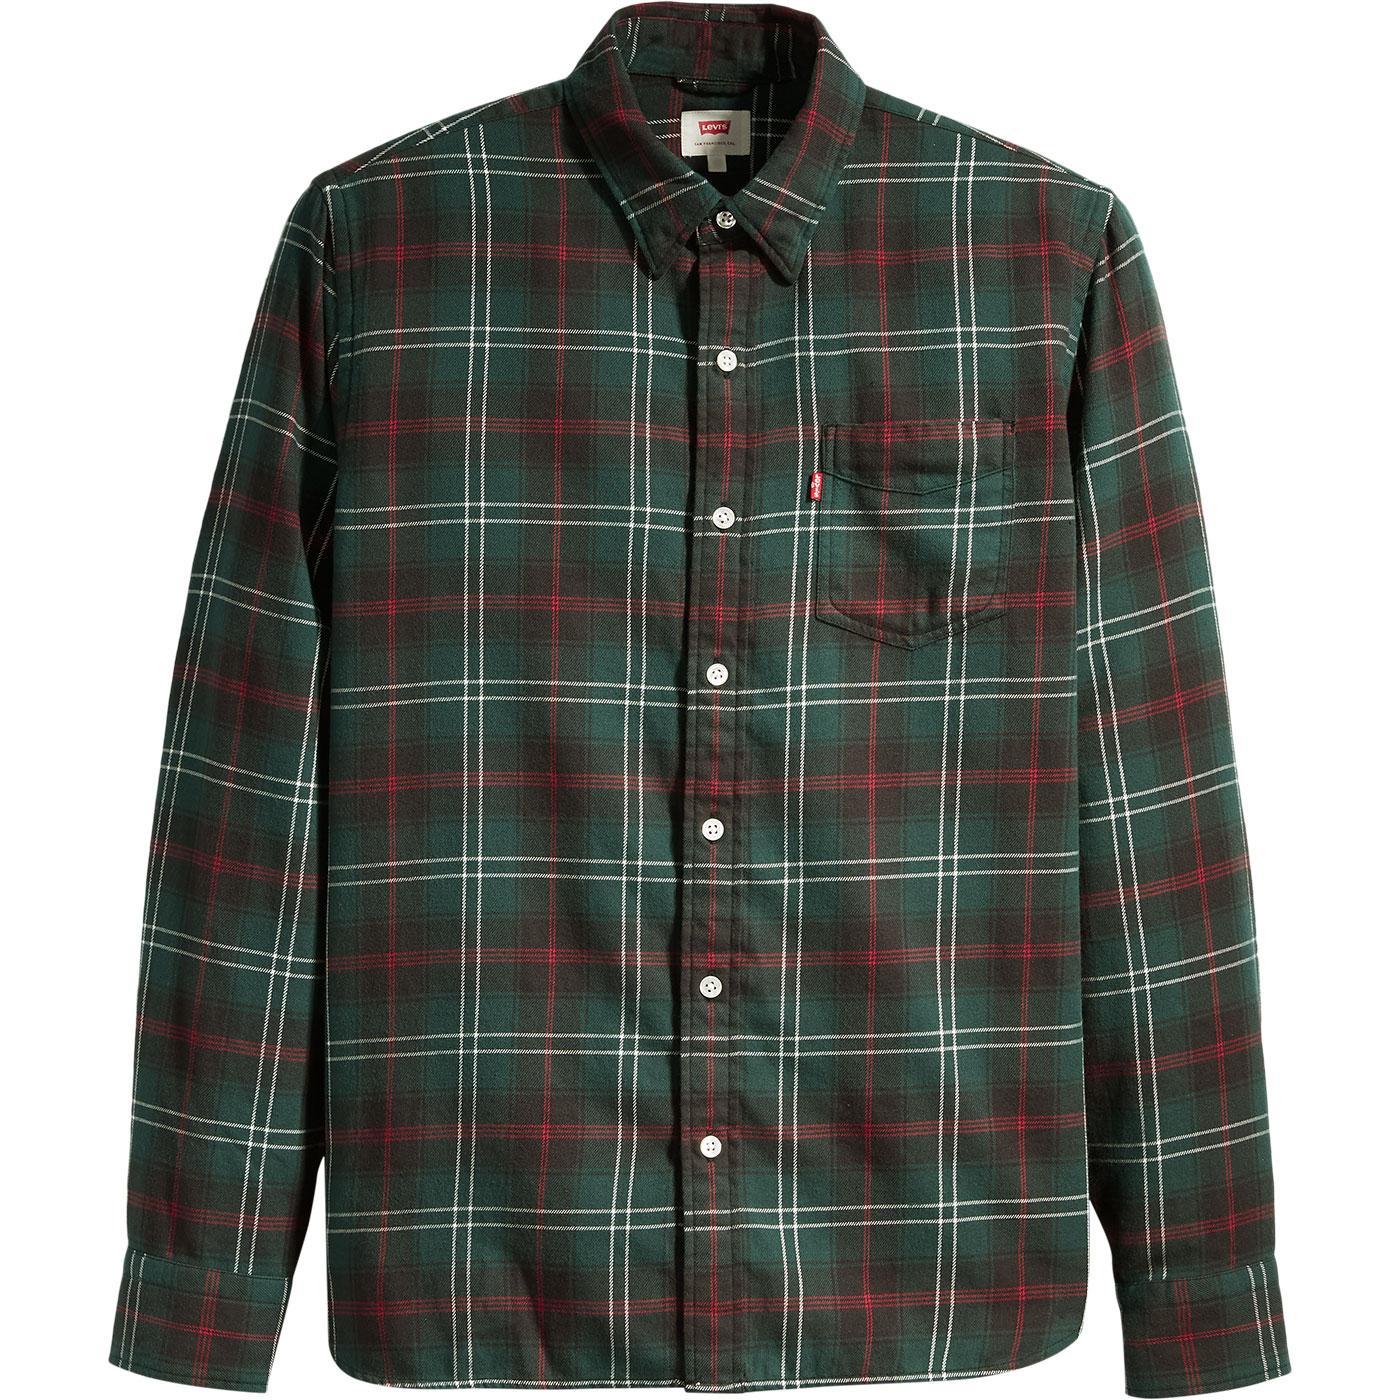 LEVI'S Mod Sunset 1 Pocket Tartan Check Shirt (C)